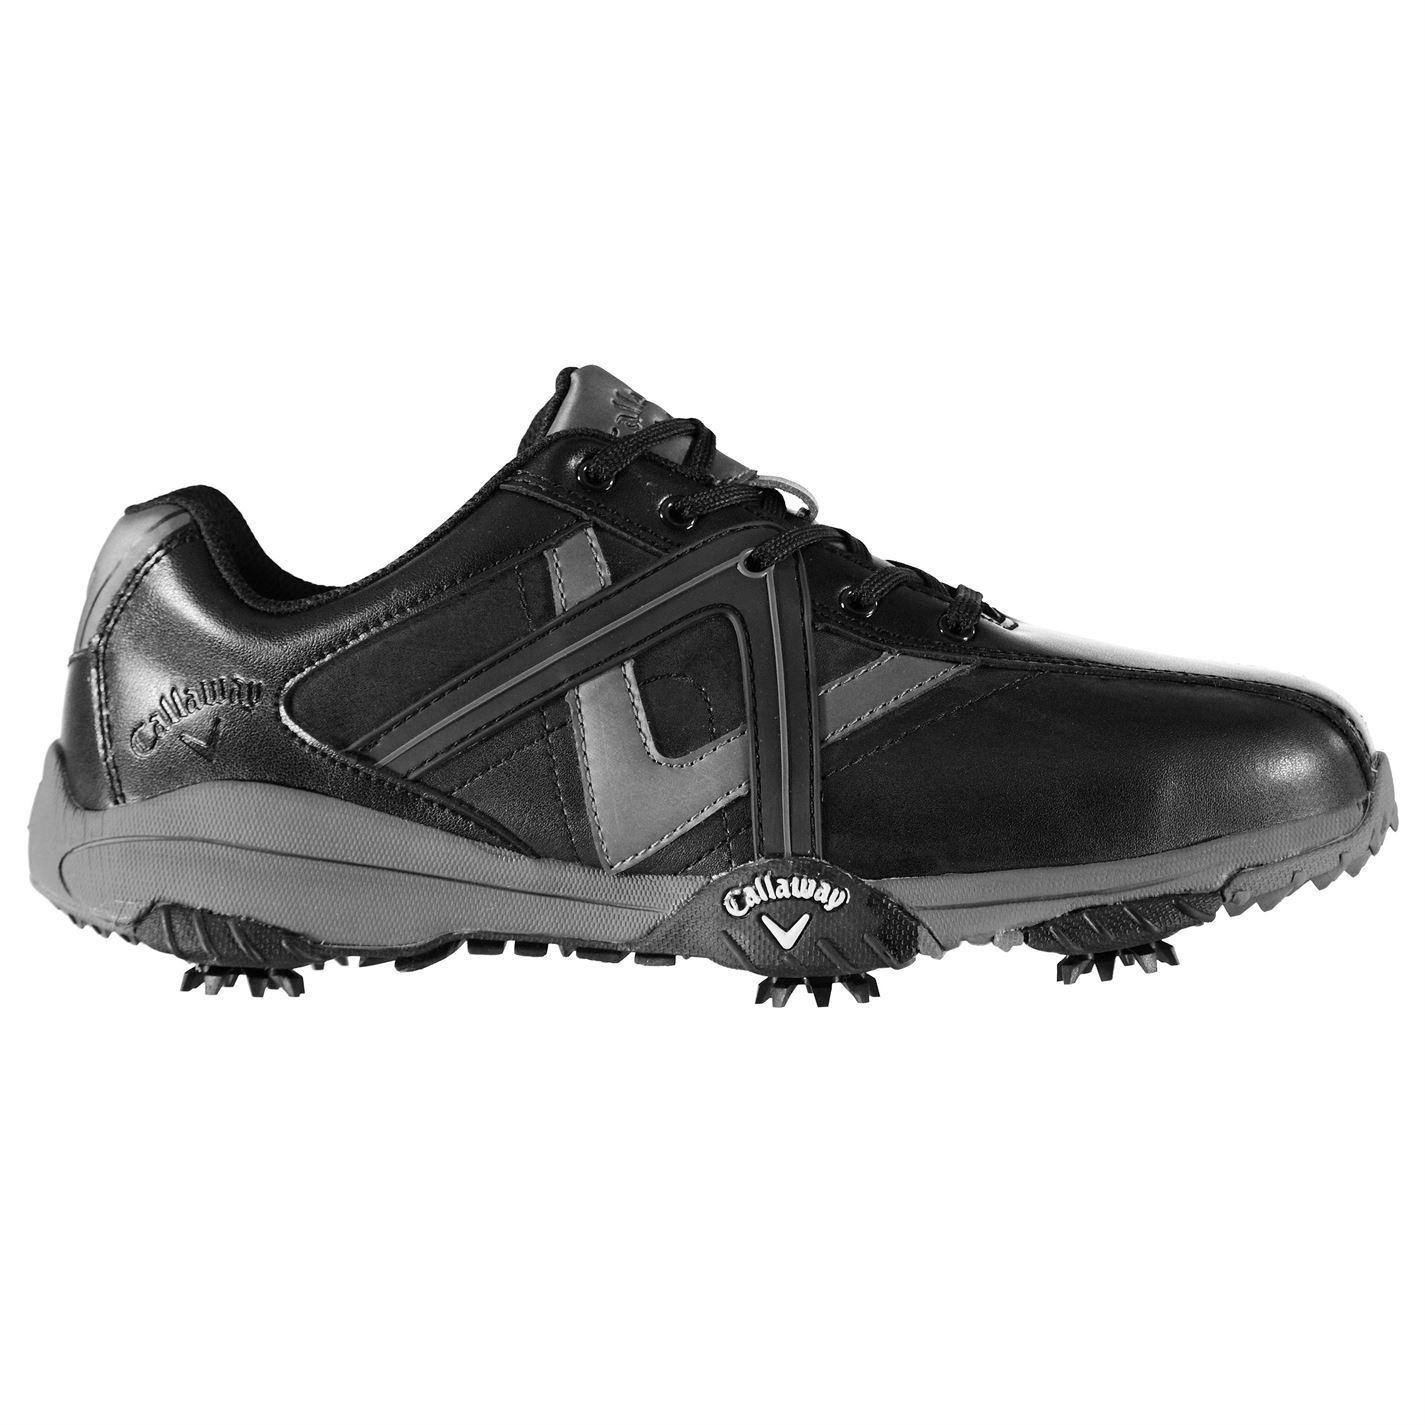 Callaway-Cheviot-ll-Golf-Shoes-Mens-Spikes-Footwear thumbnail 3